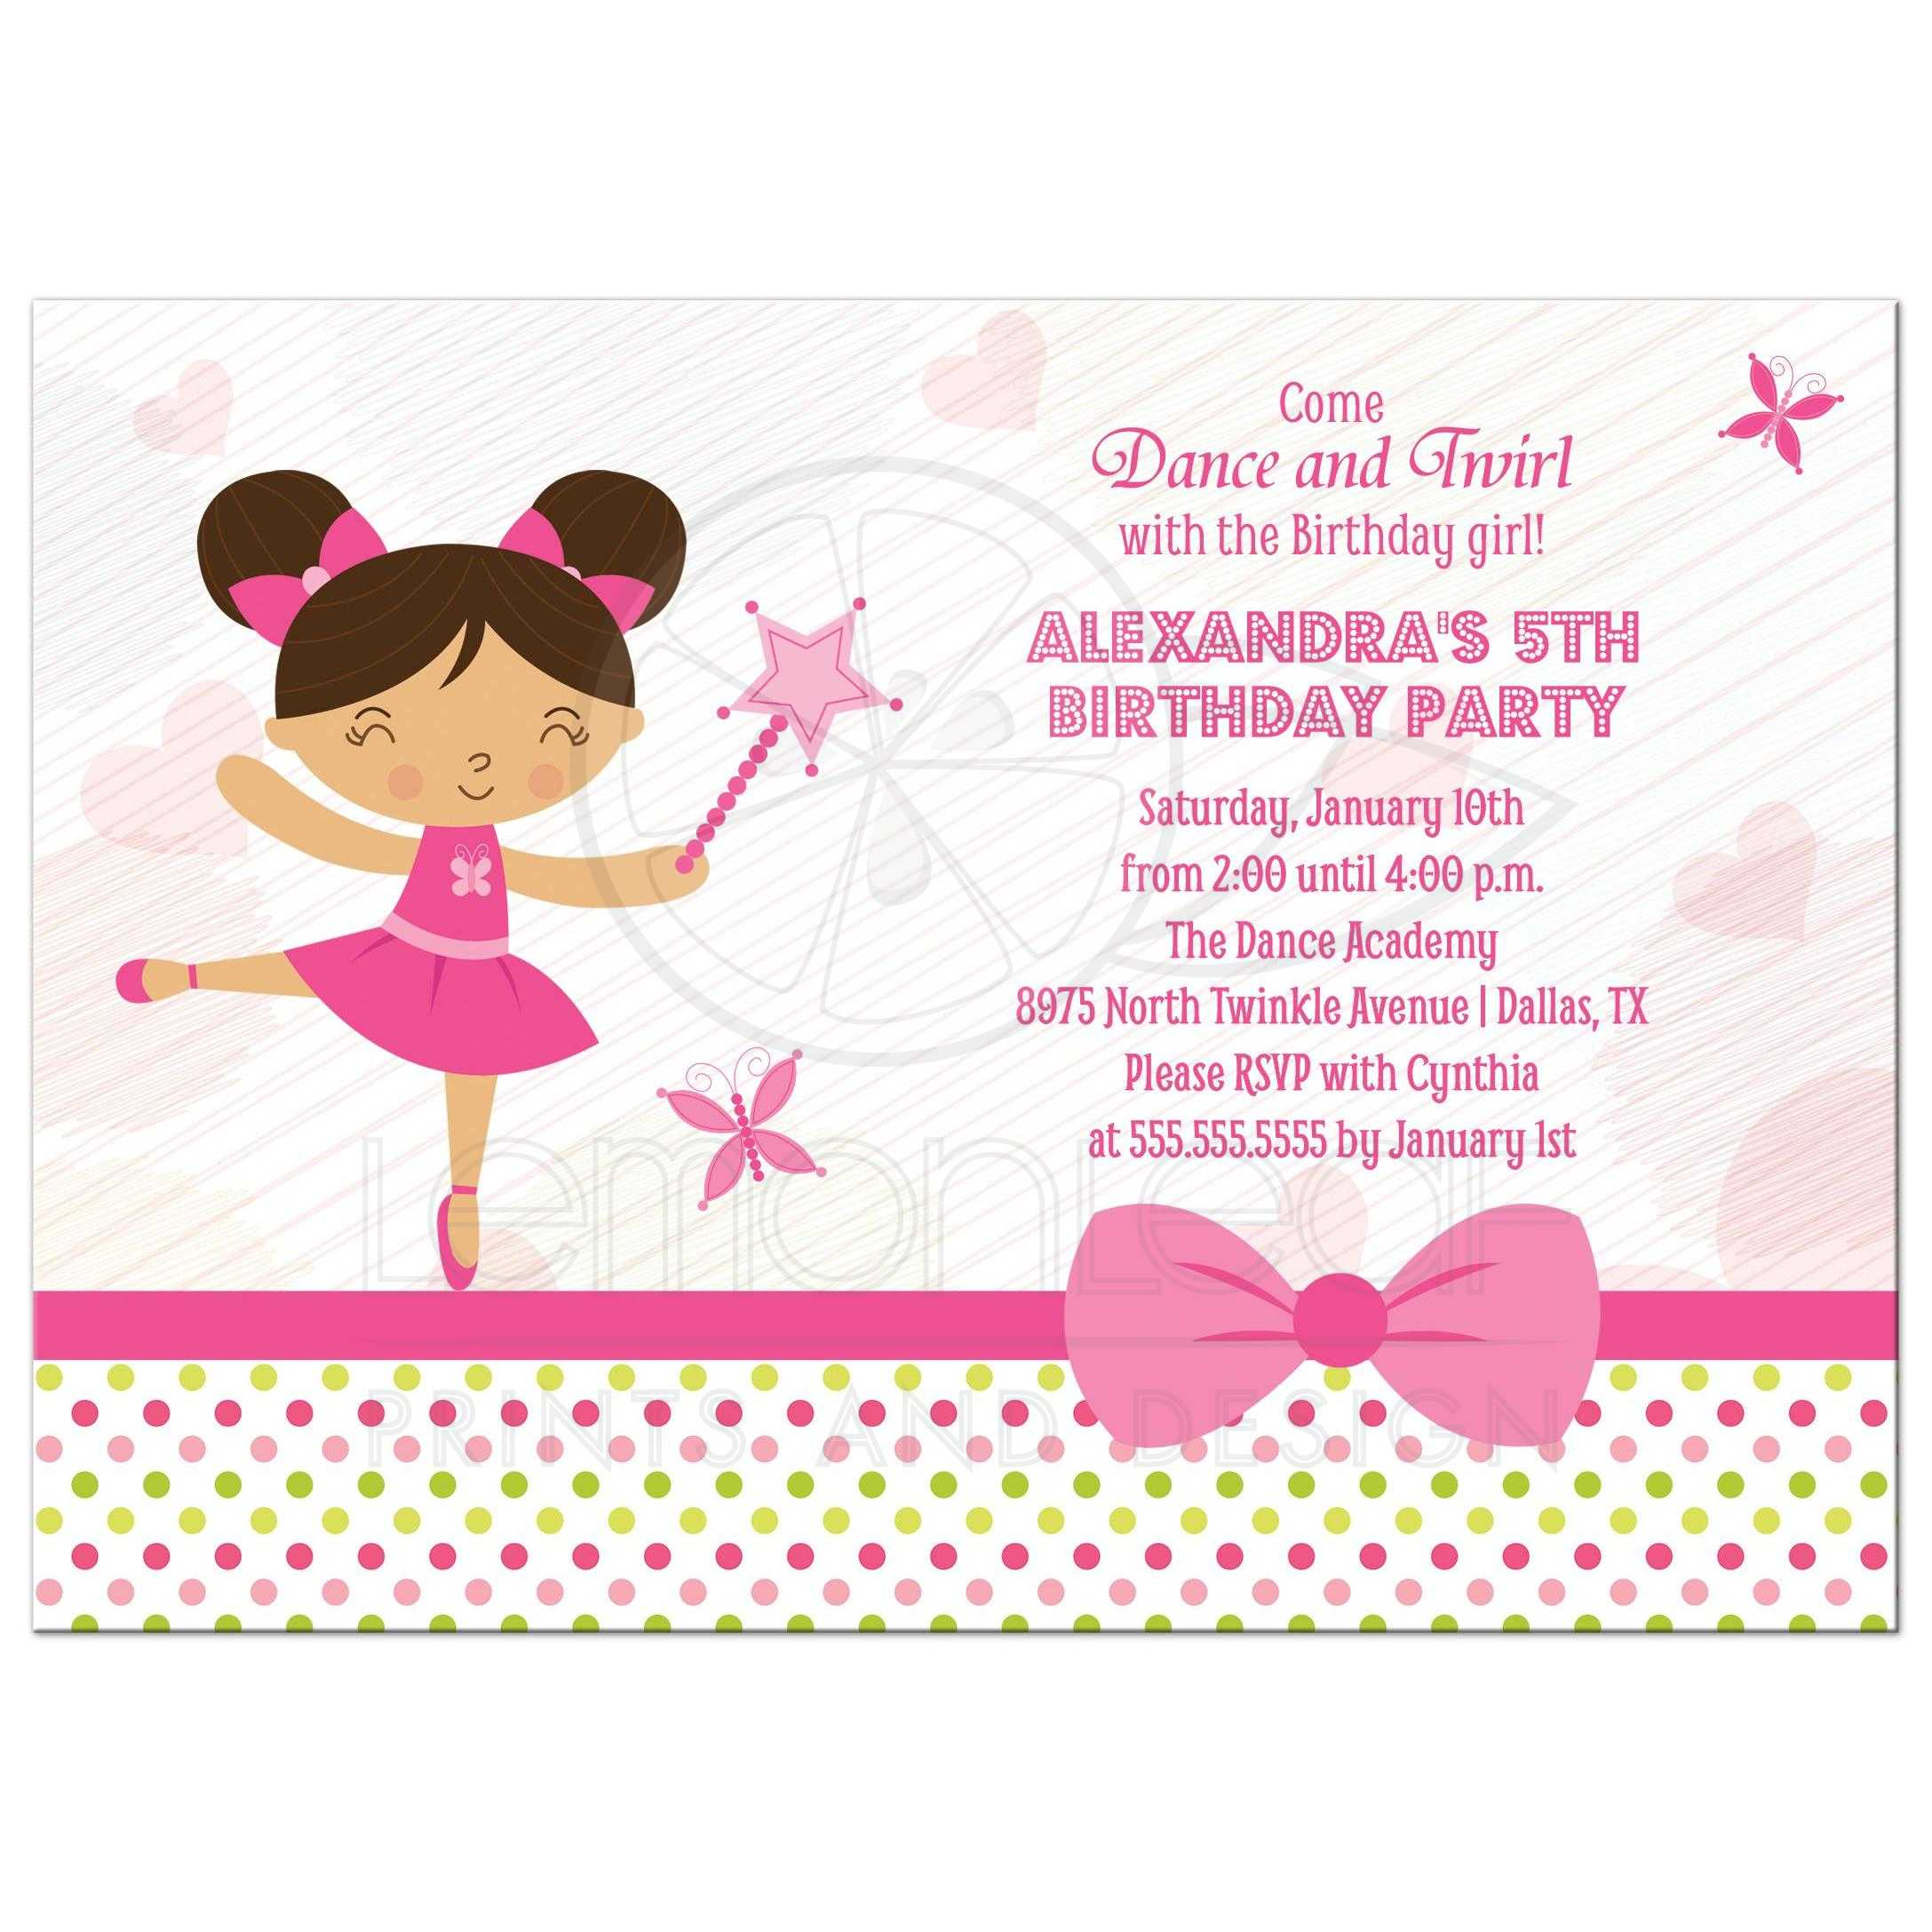 birthday party invitation girls pink ballerina fairy brown hair